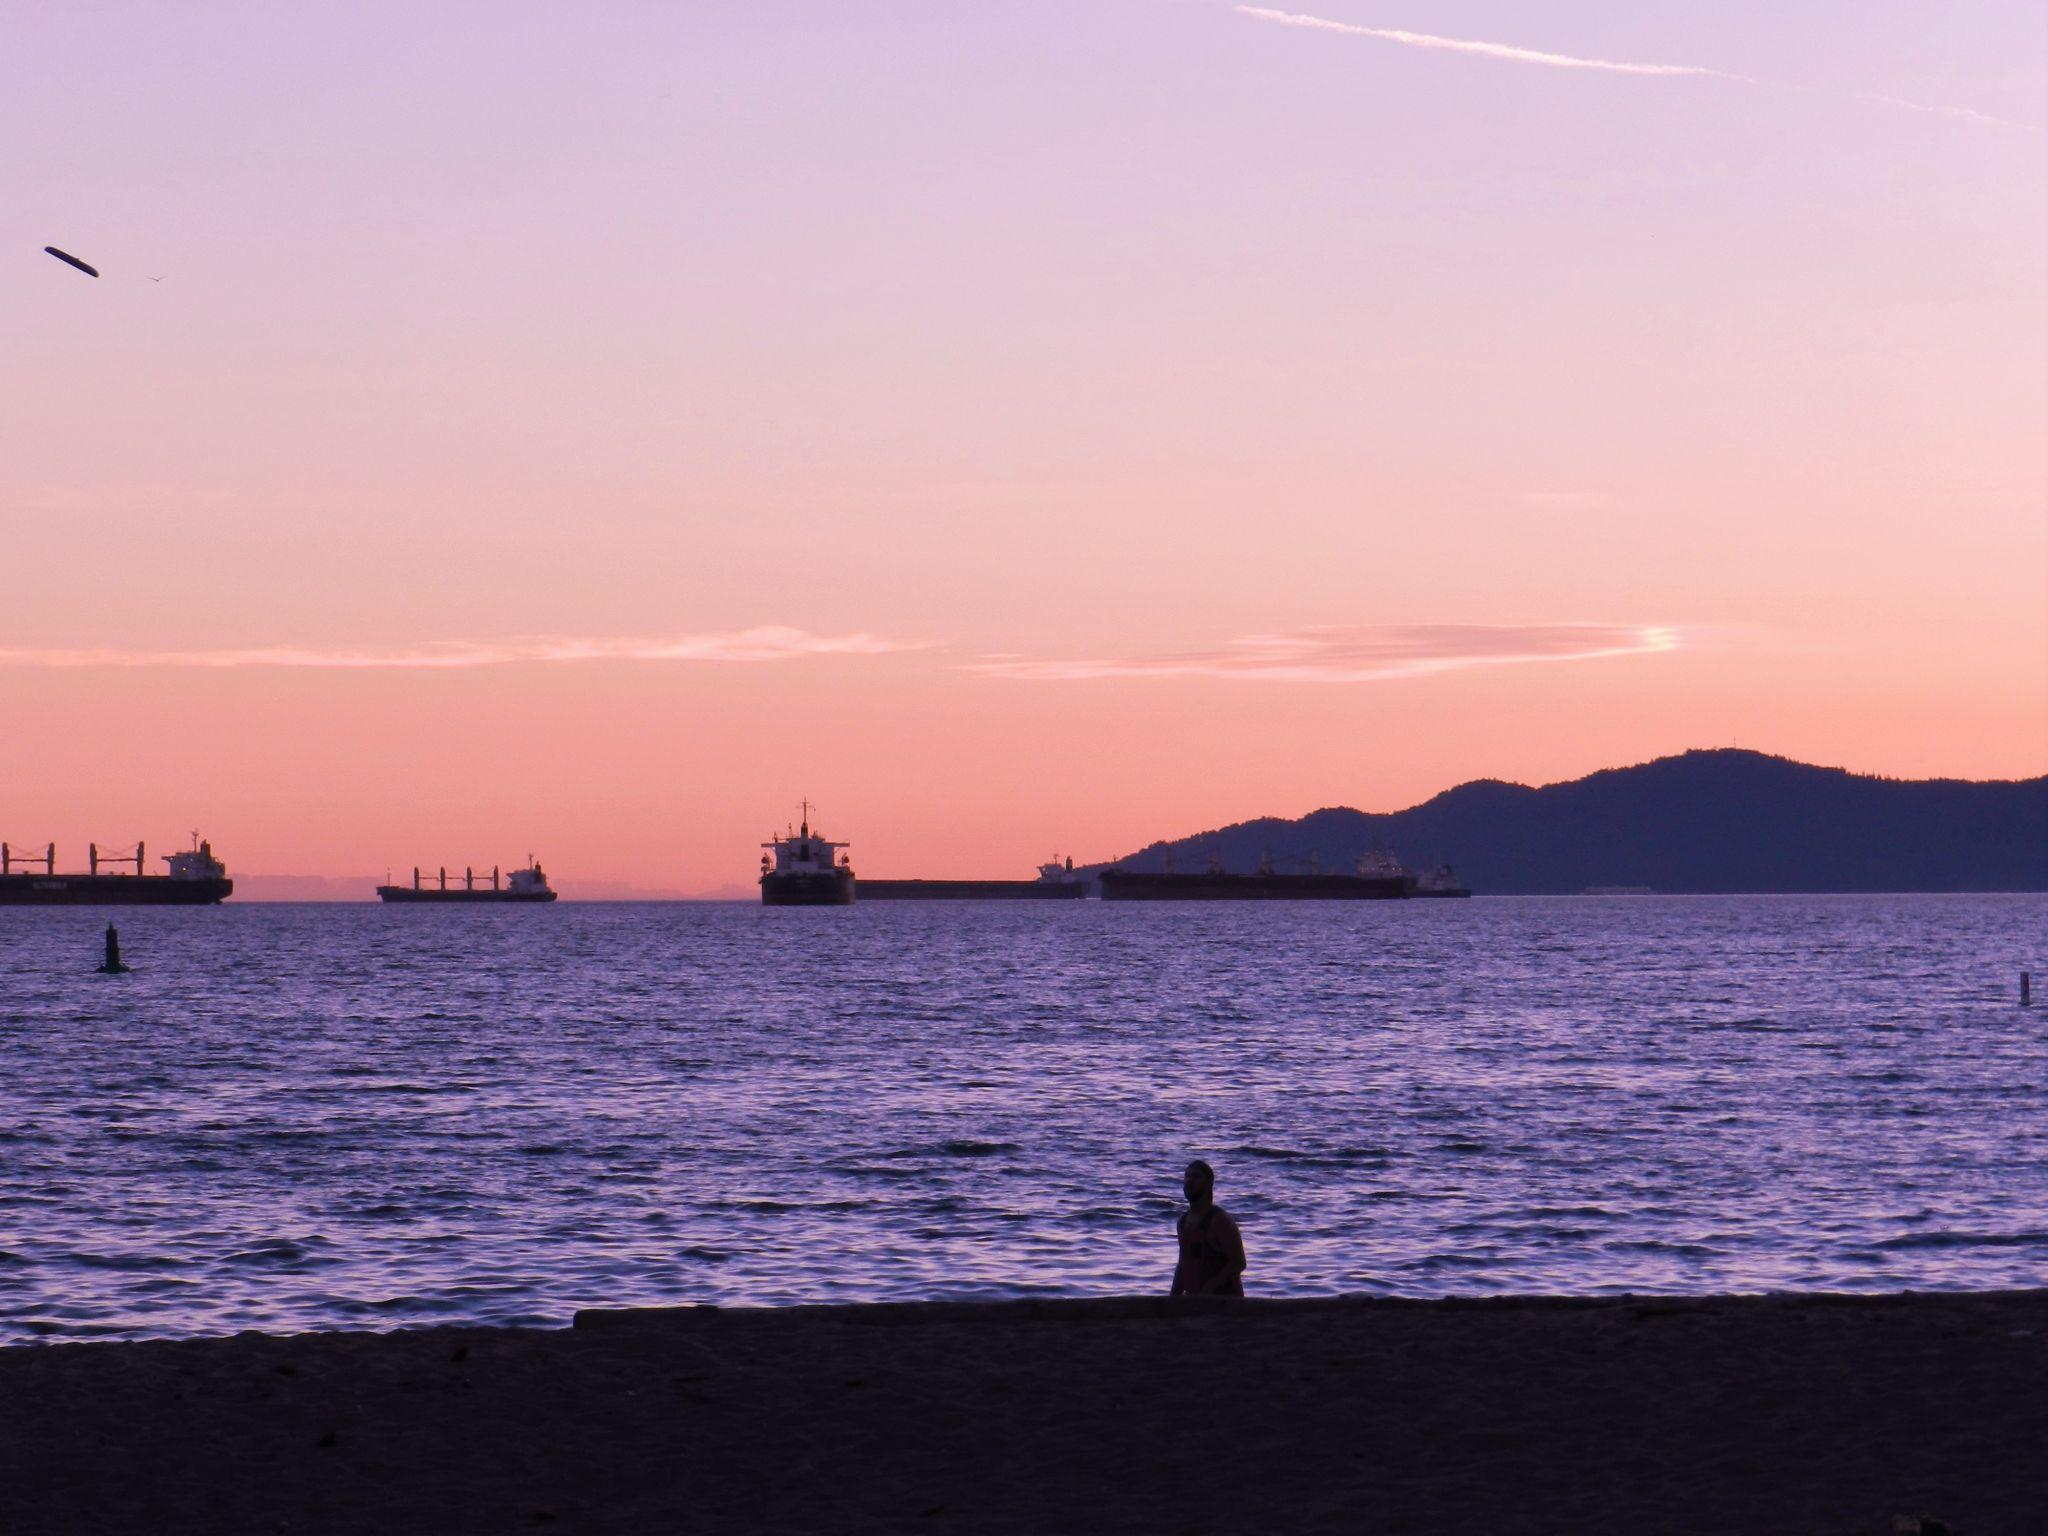 Ocean view at English Bay, Vancouver, Canada